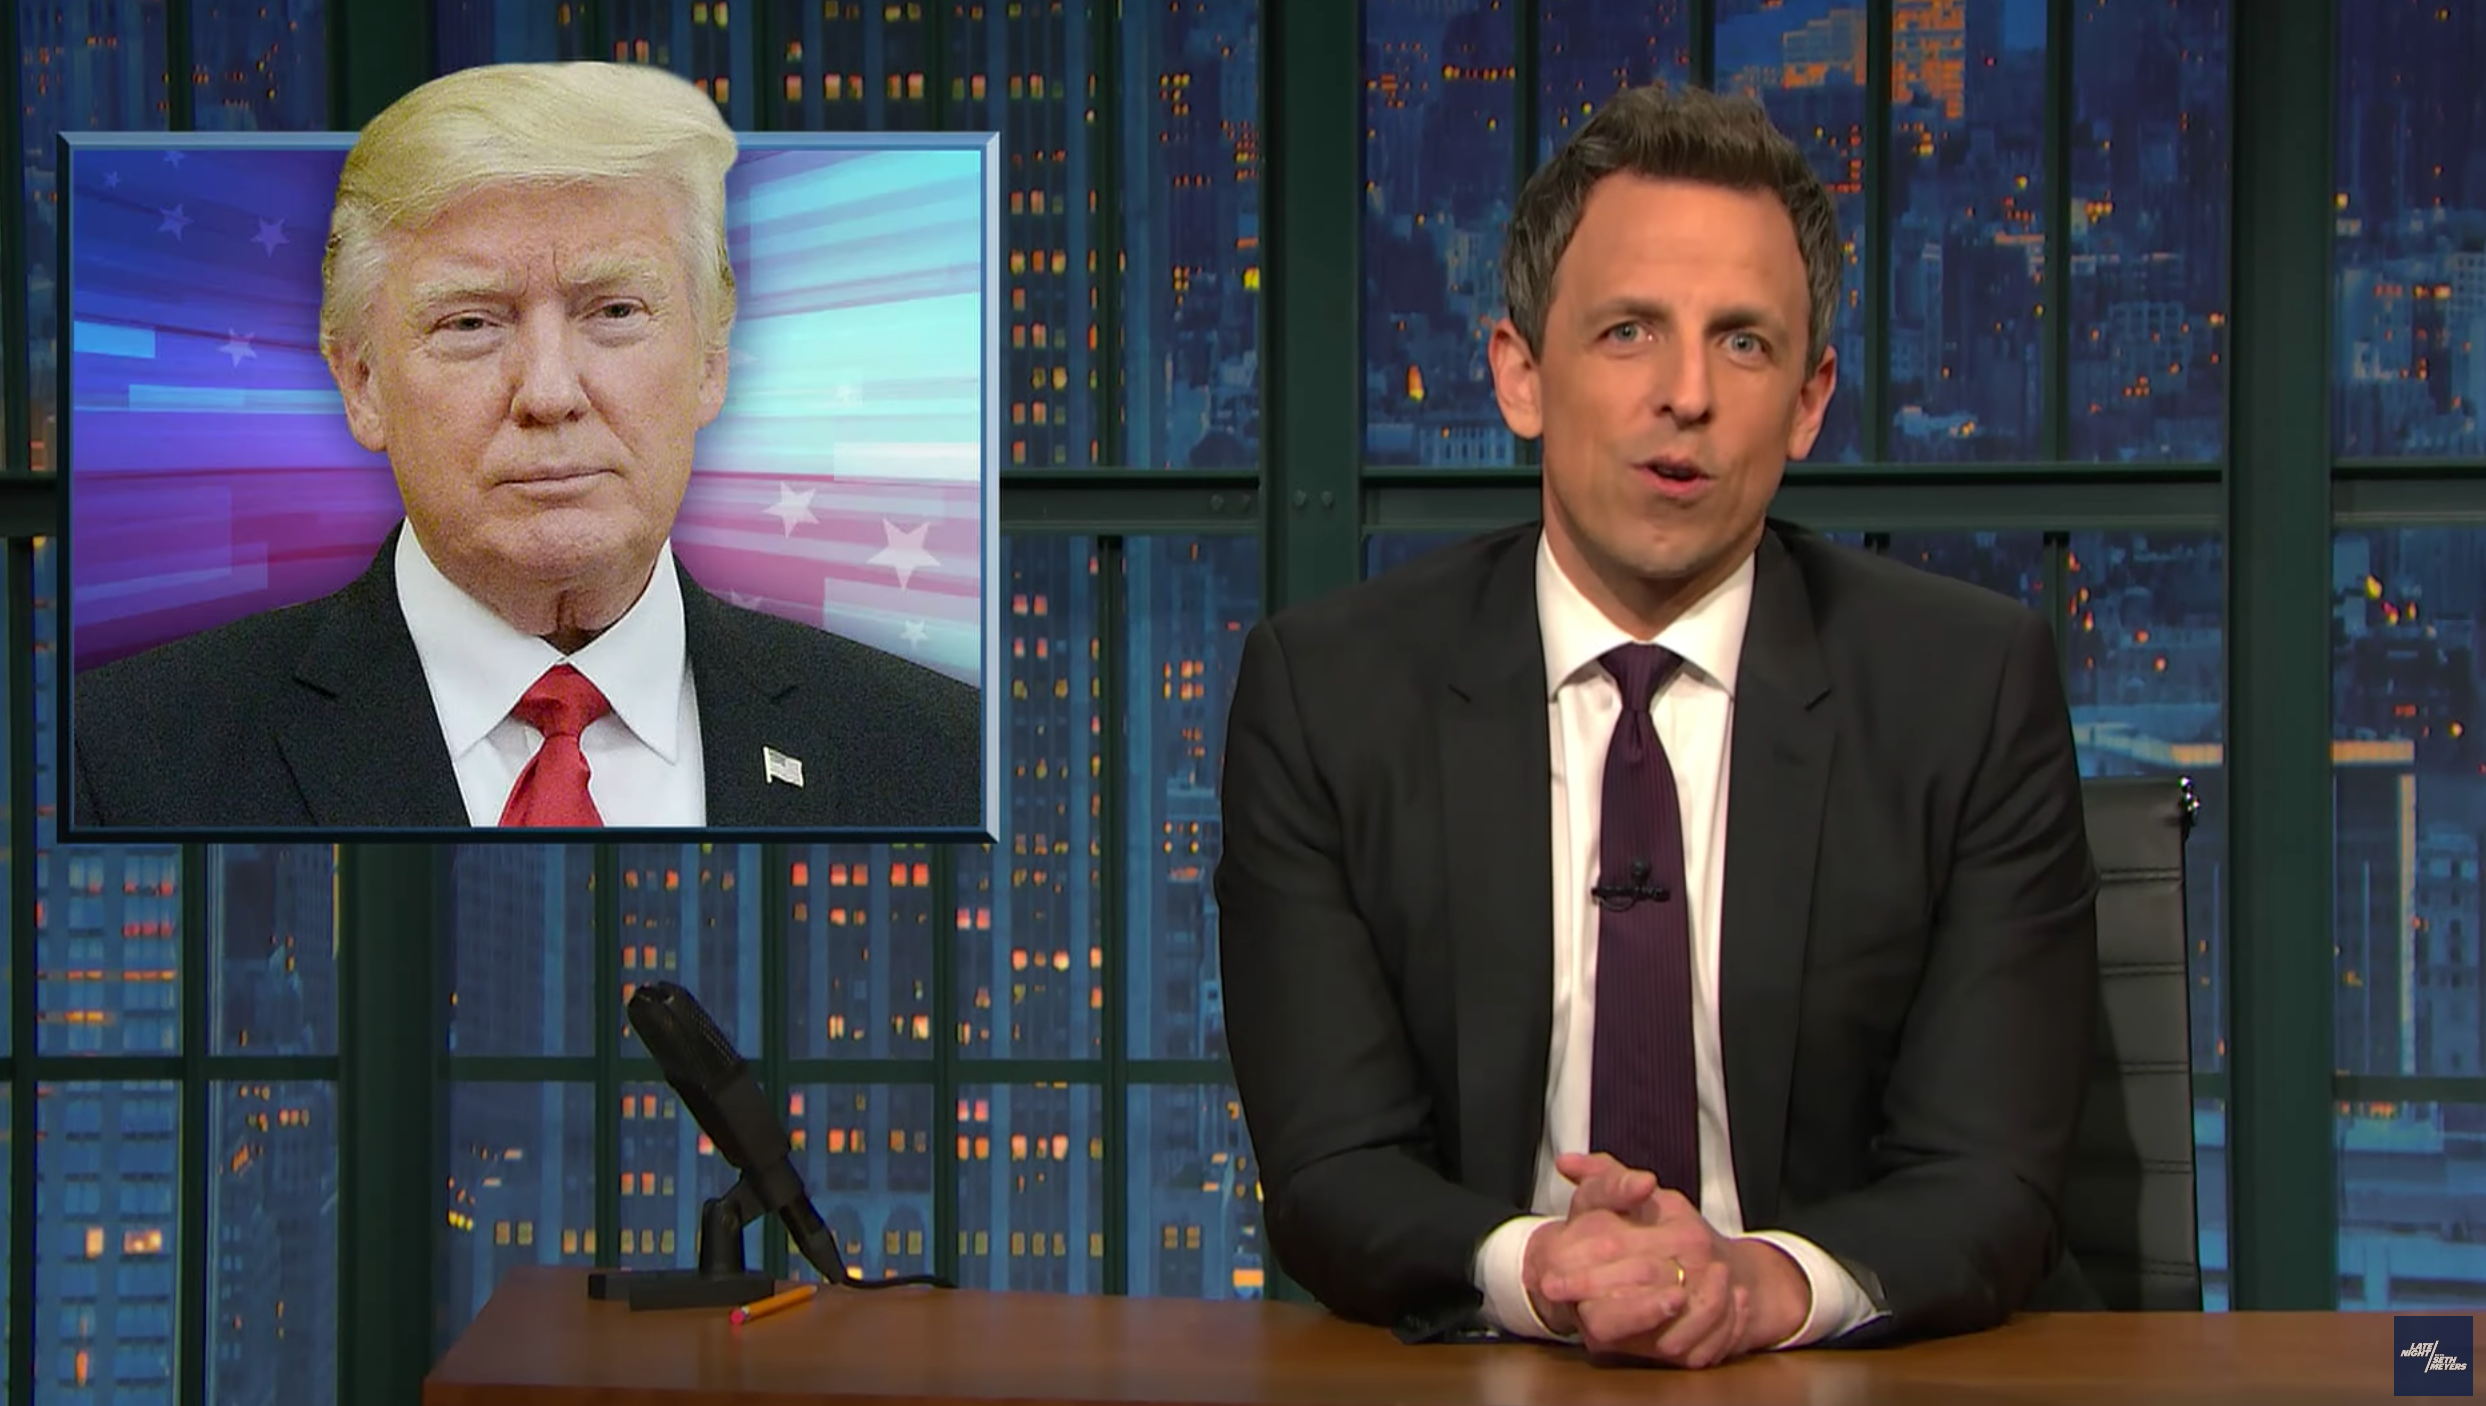 WATCH: Seth Meyers Slams Trump Muslim-Ban On Late Night